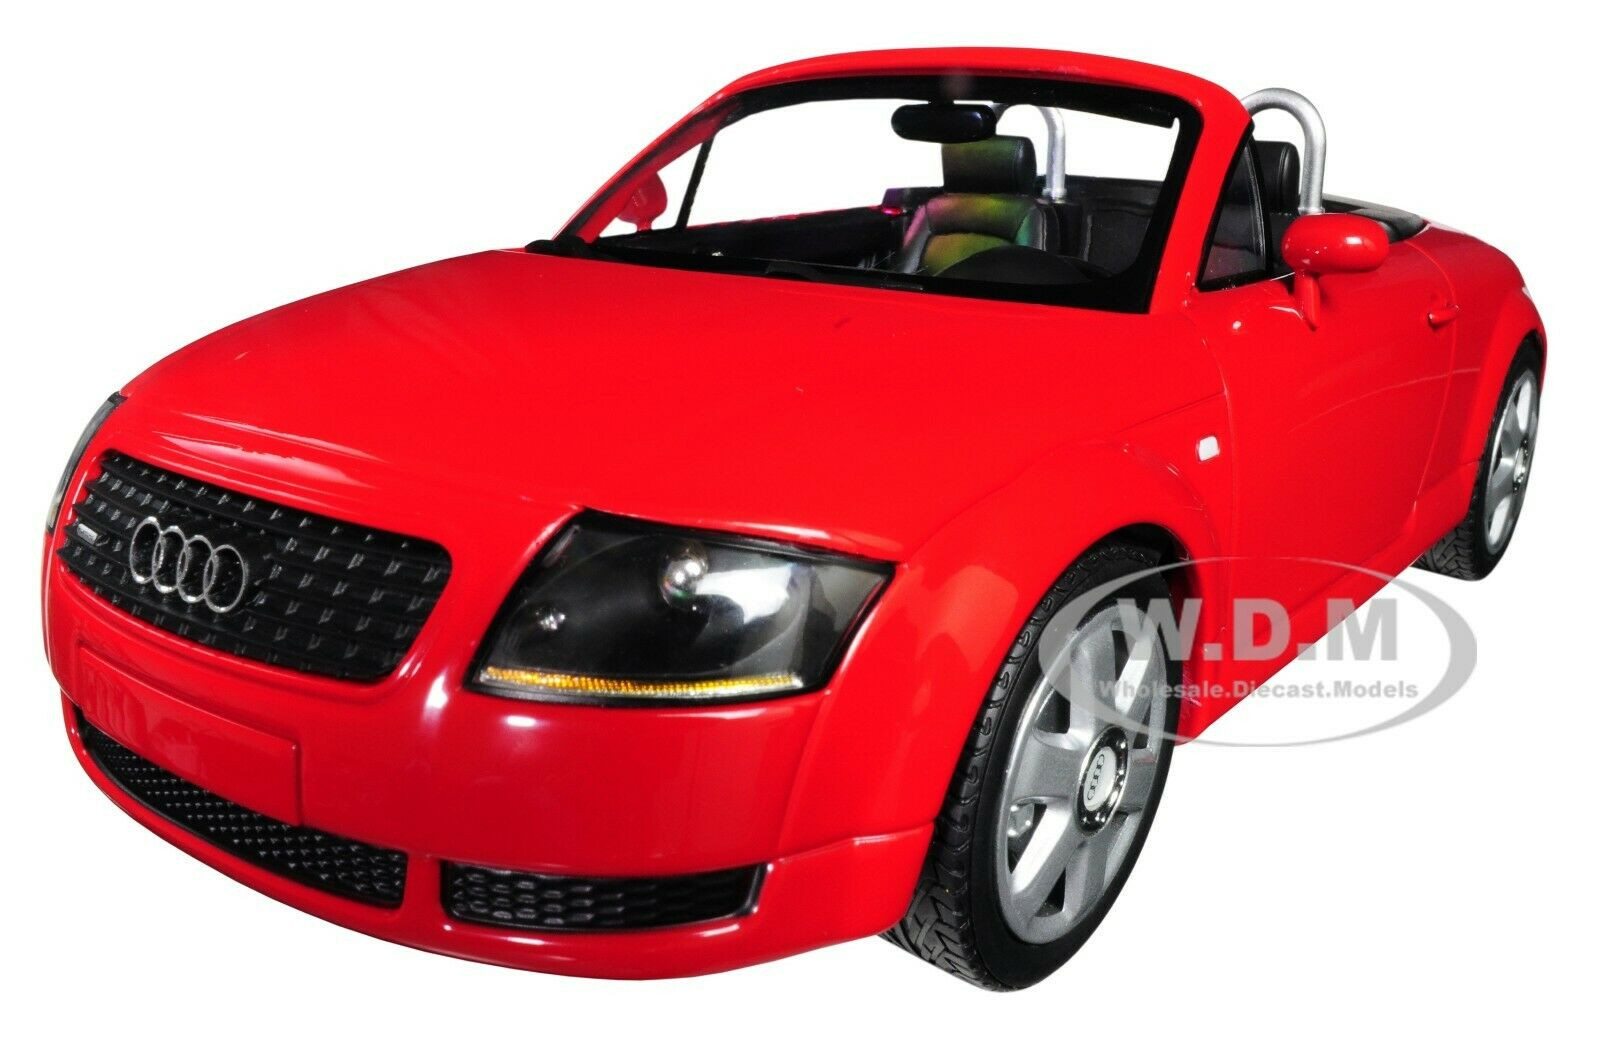 1999 AUDI TT ROADSTER RED LTD 300 PCS 1 18 DIECAST CAR BY MINICHAMPS 155017032